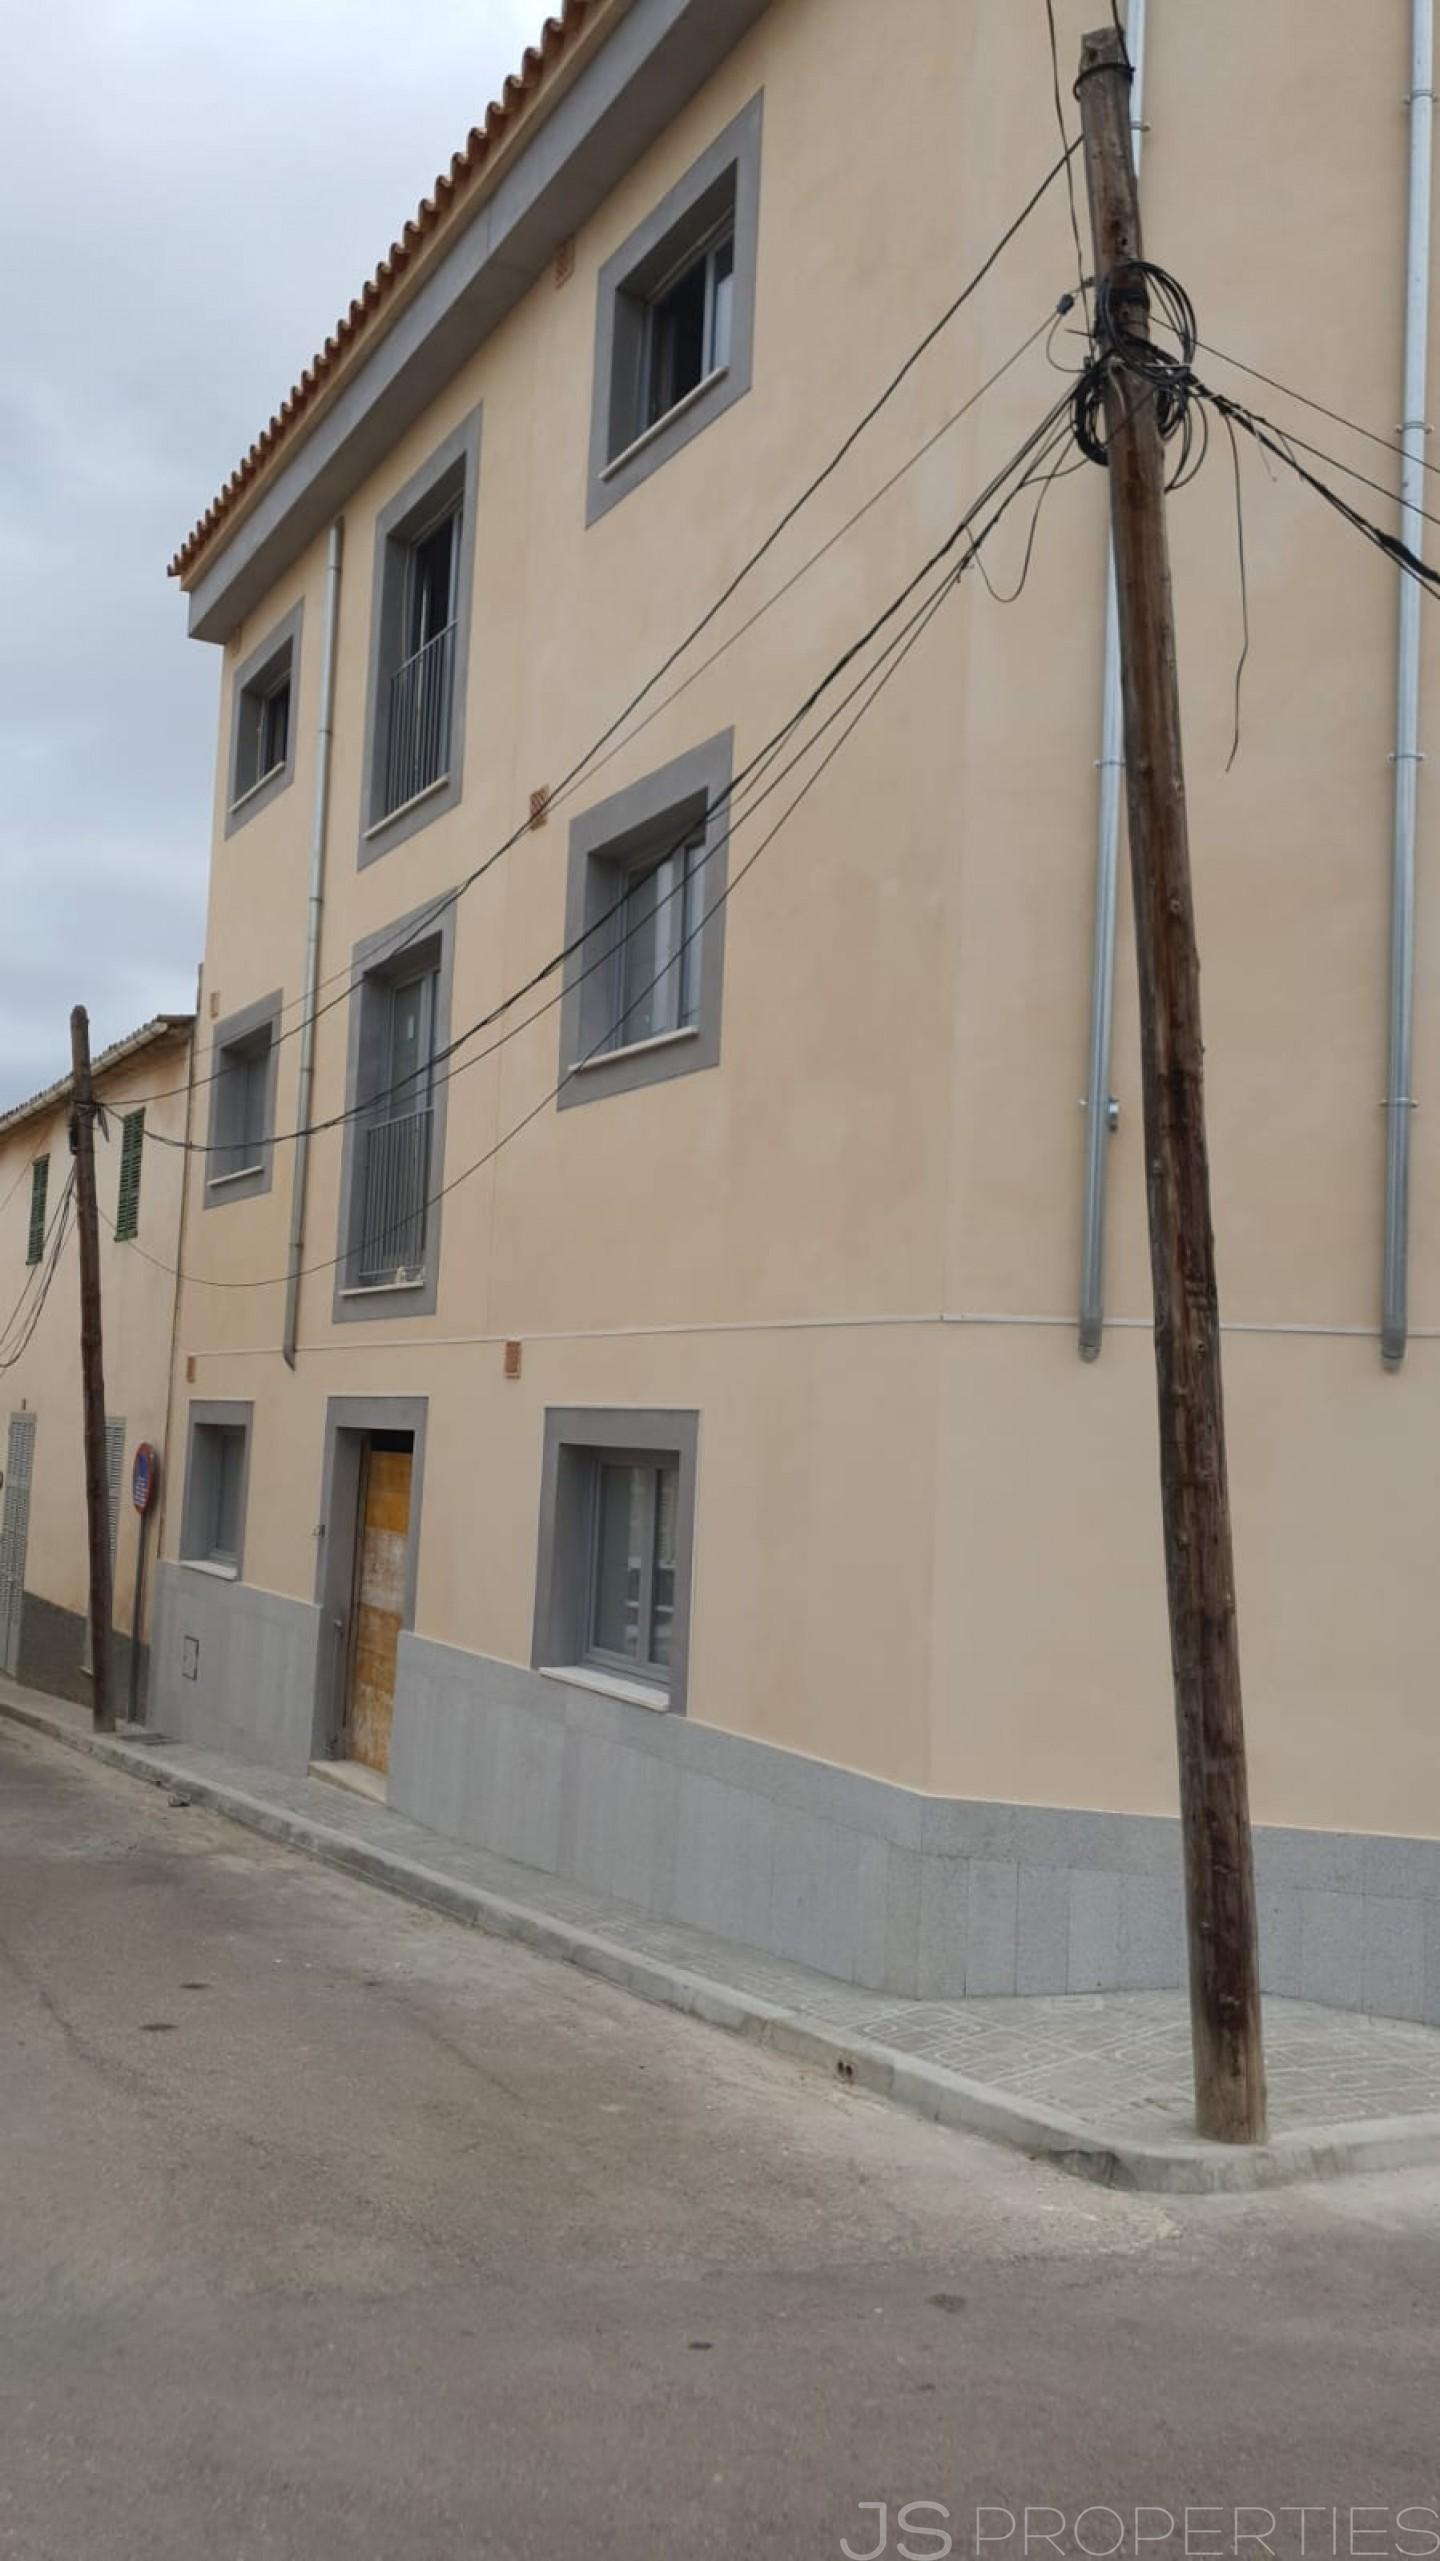 APARTMENTS FOR SALE IN NEW DEVELOPMENT BLOCK IN SANTA MARGALIDA